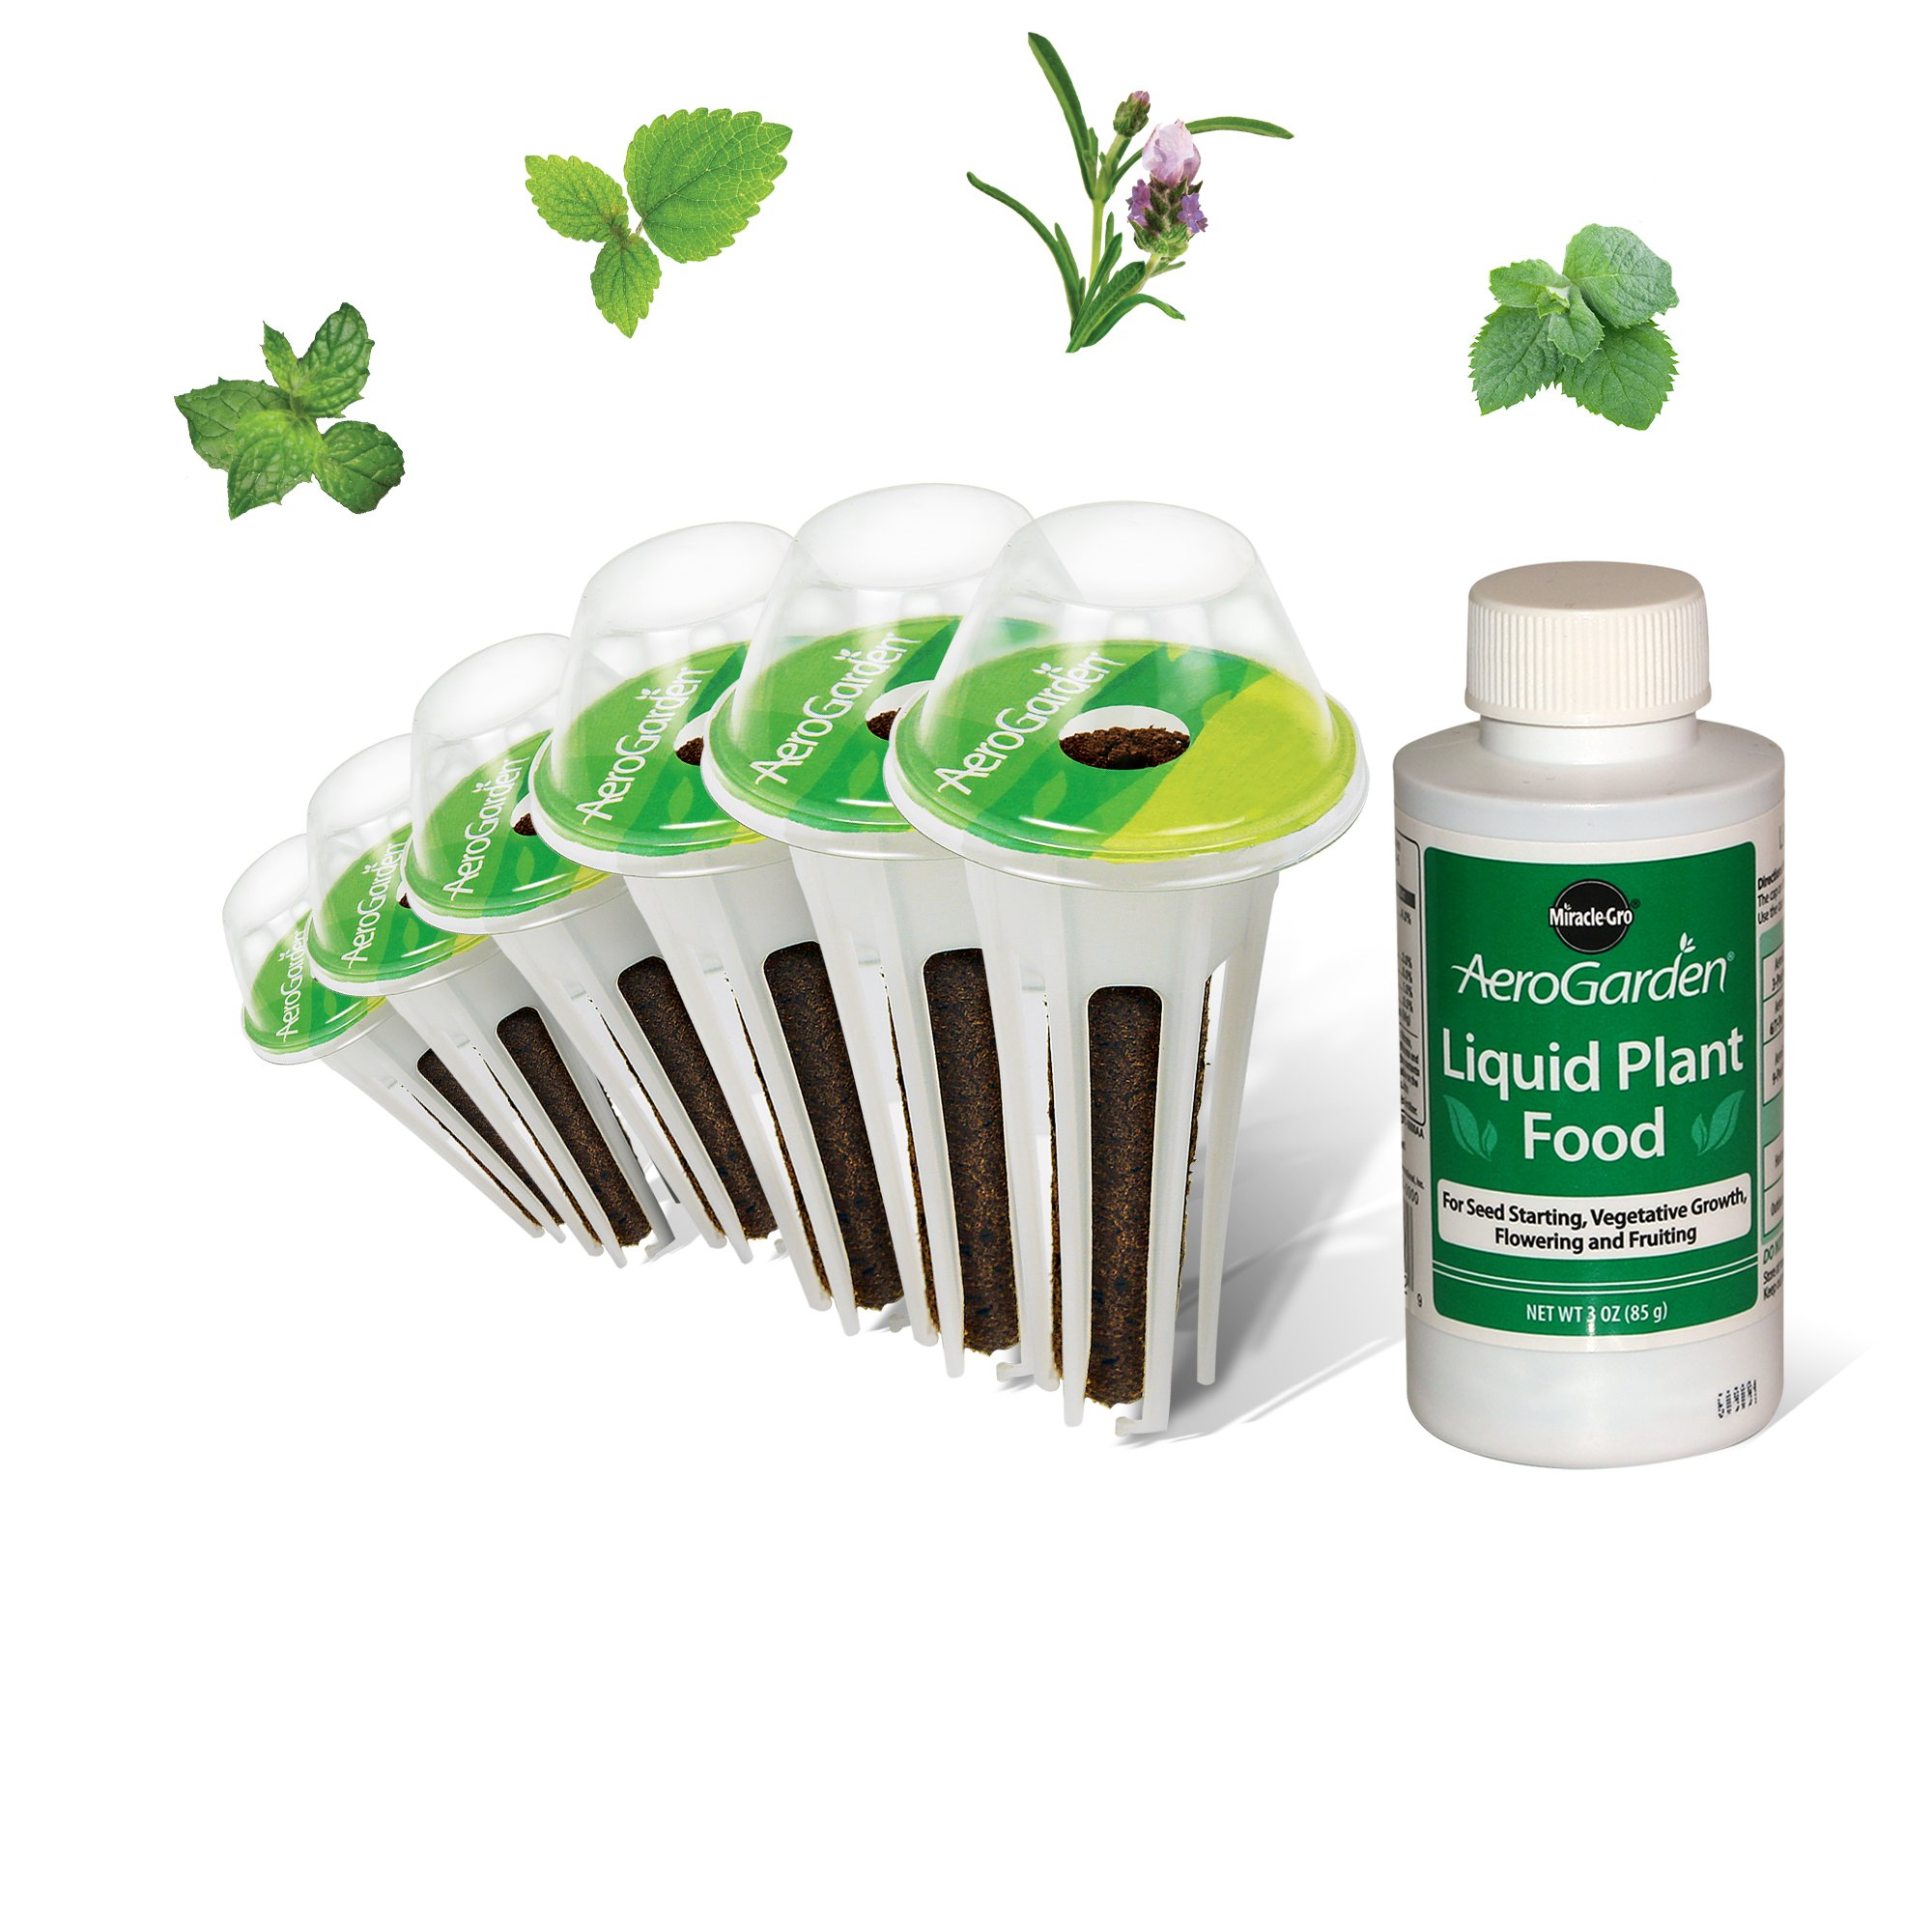 AeroGarden Tea Seed Pod Kit (Mint/Lemon/Lavendar) by AeroGarden